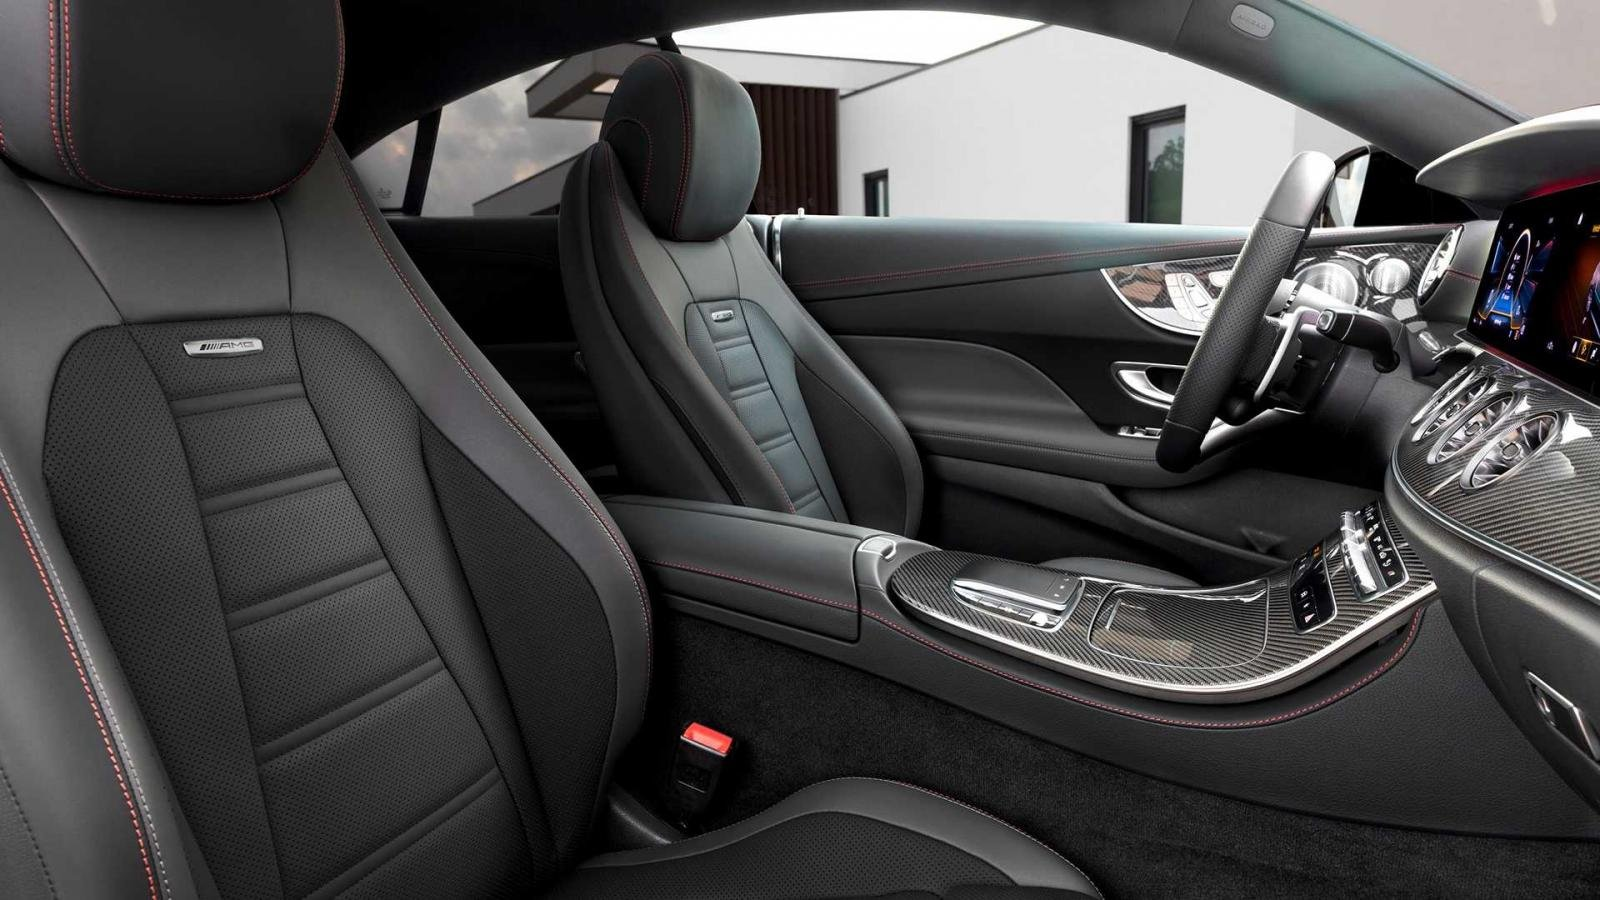 mercedes amg e53 coupe va cabriolet 2021 trinh lan 5aed